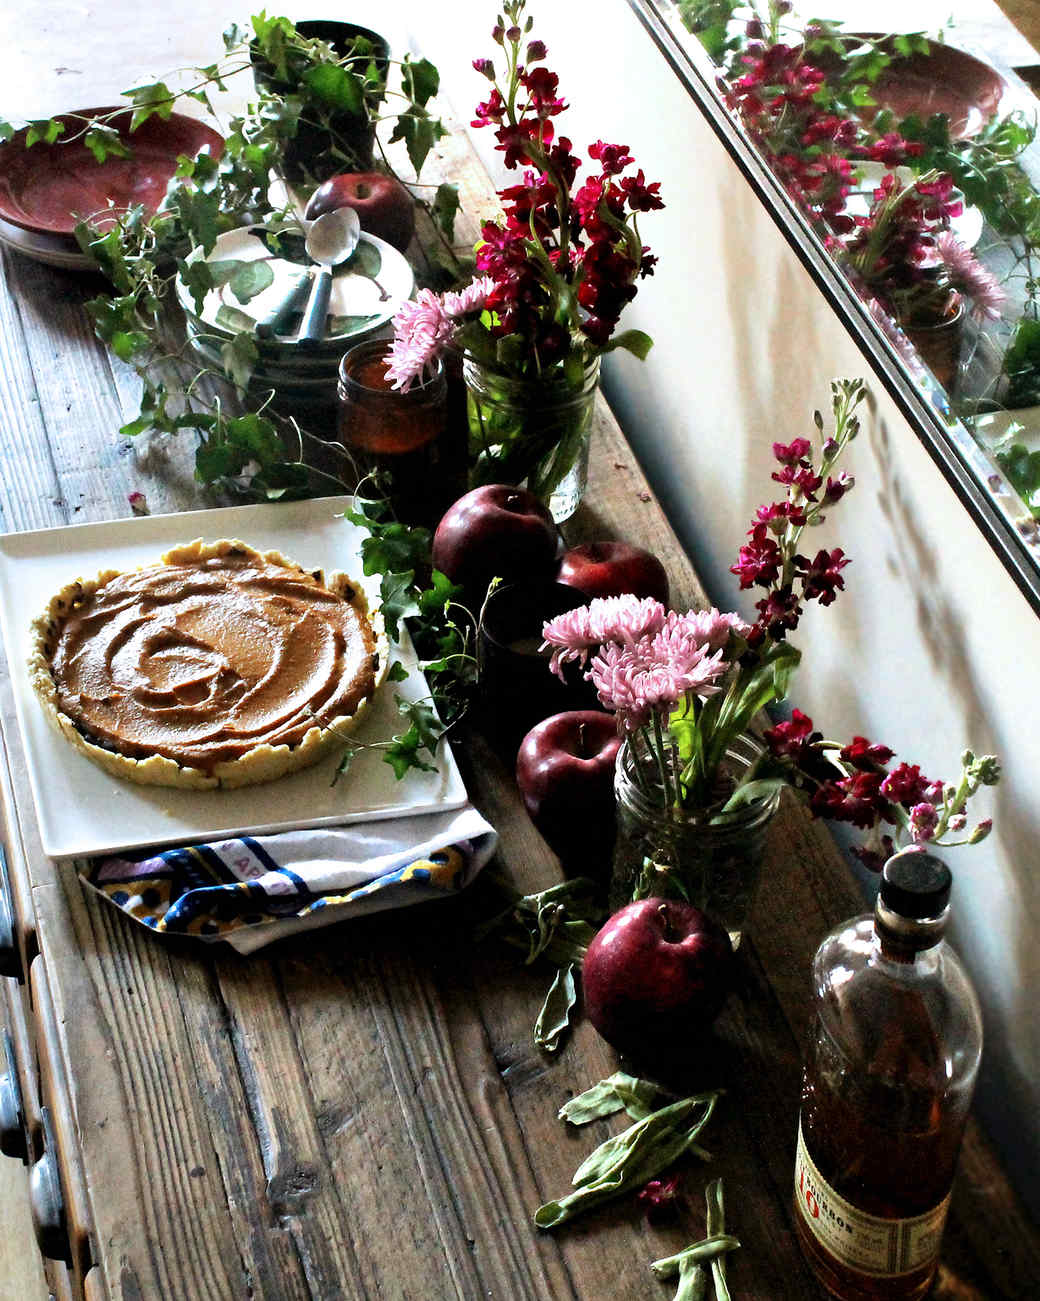 burgundy-thanksgiving-table-setting-juheakim-1115-inline.jpg